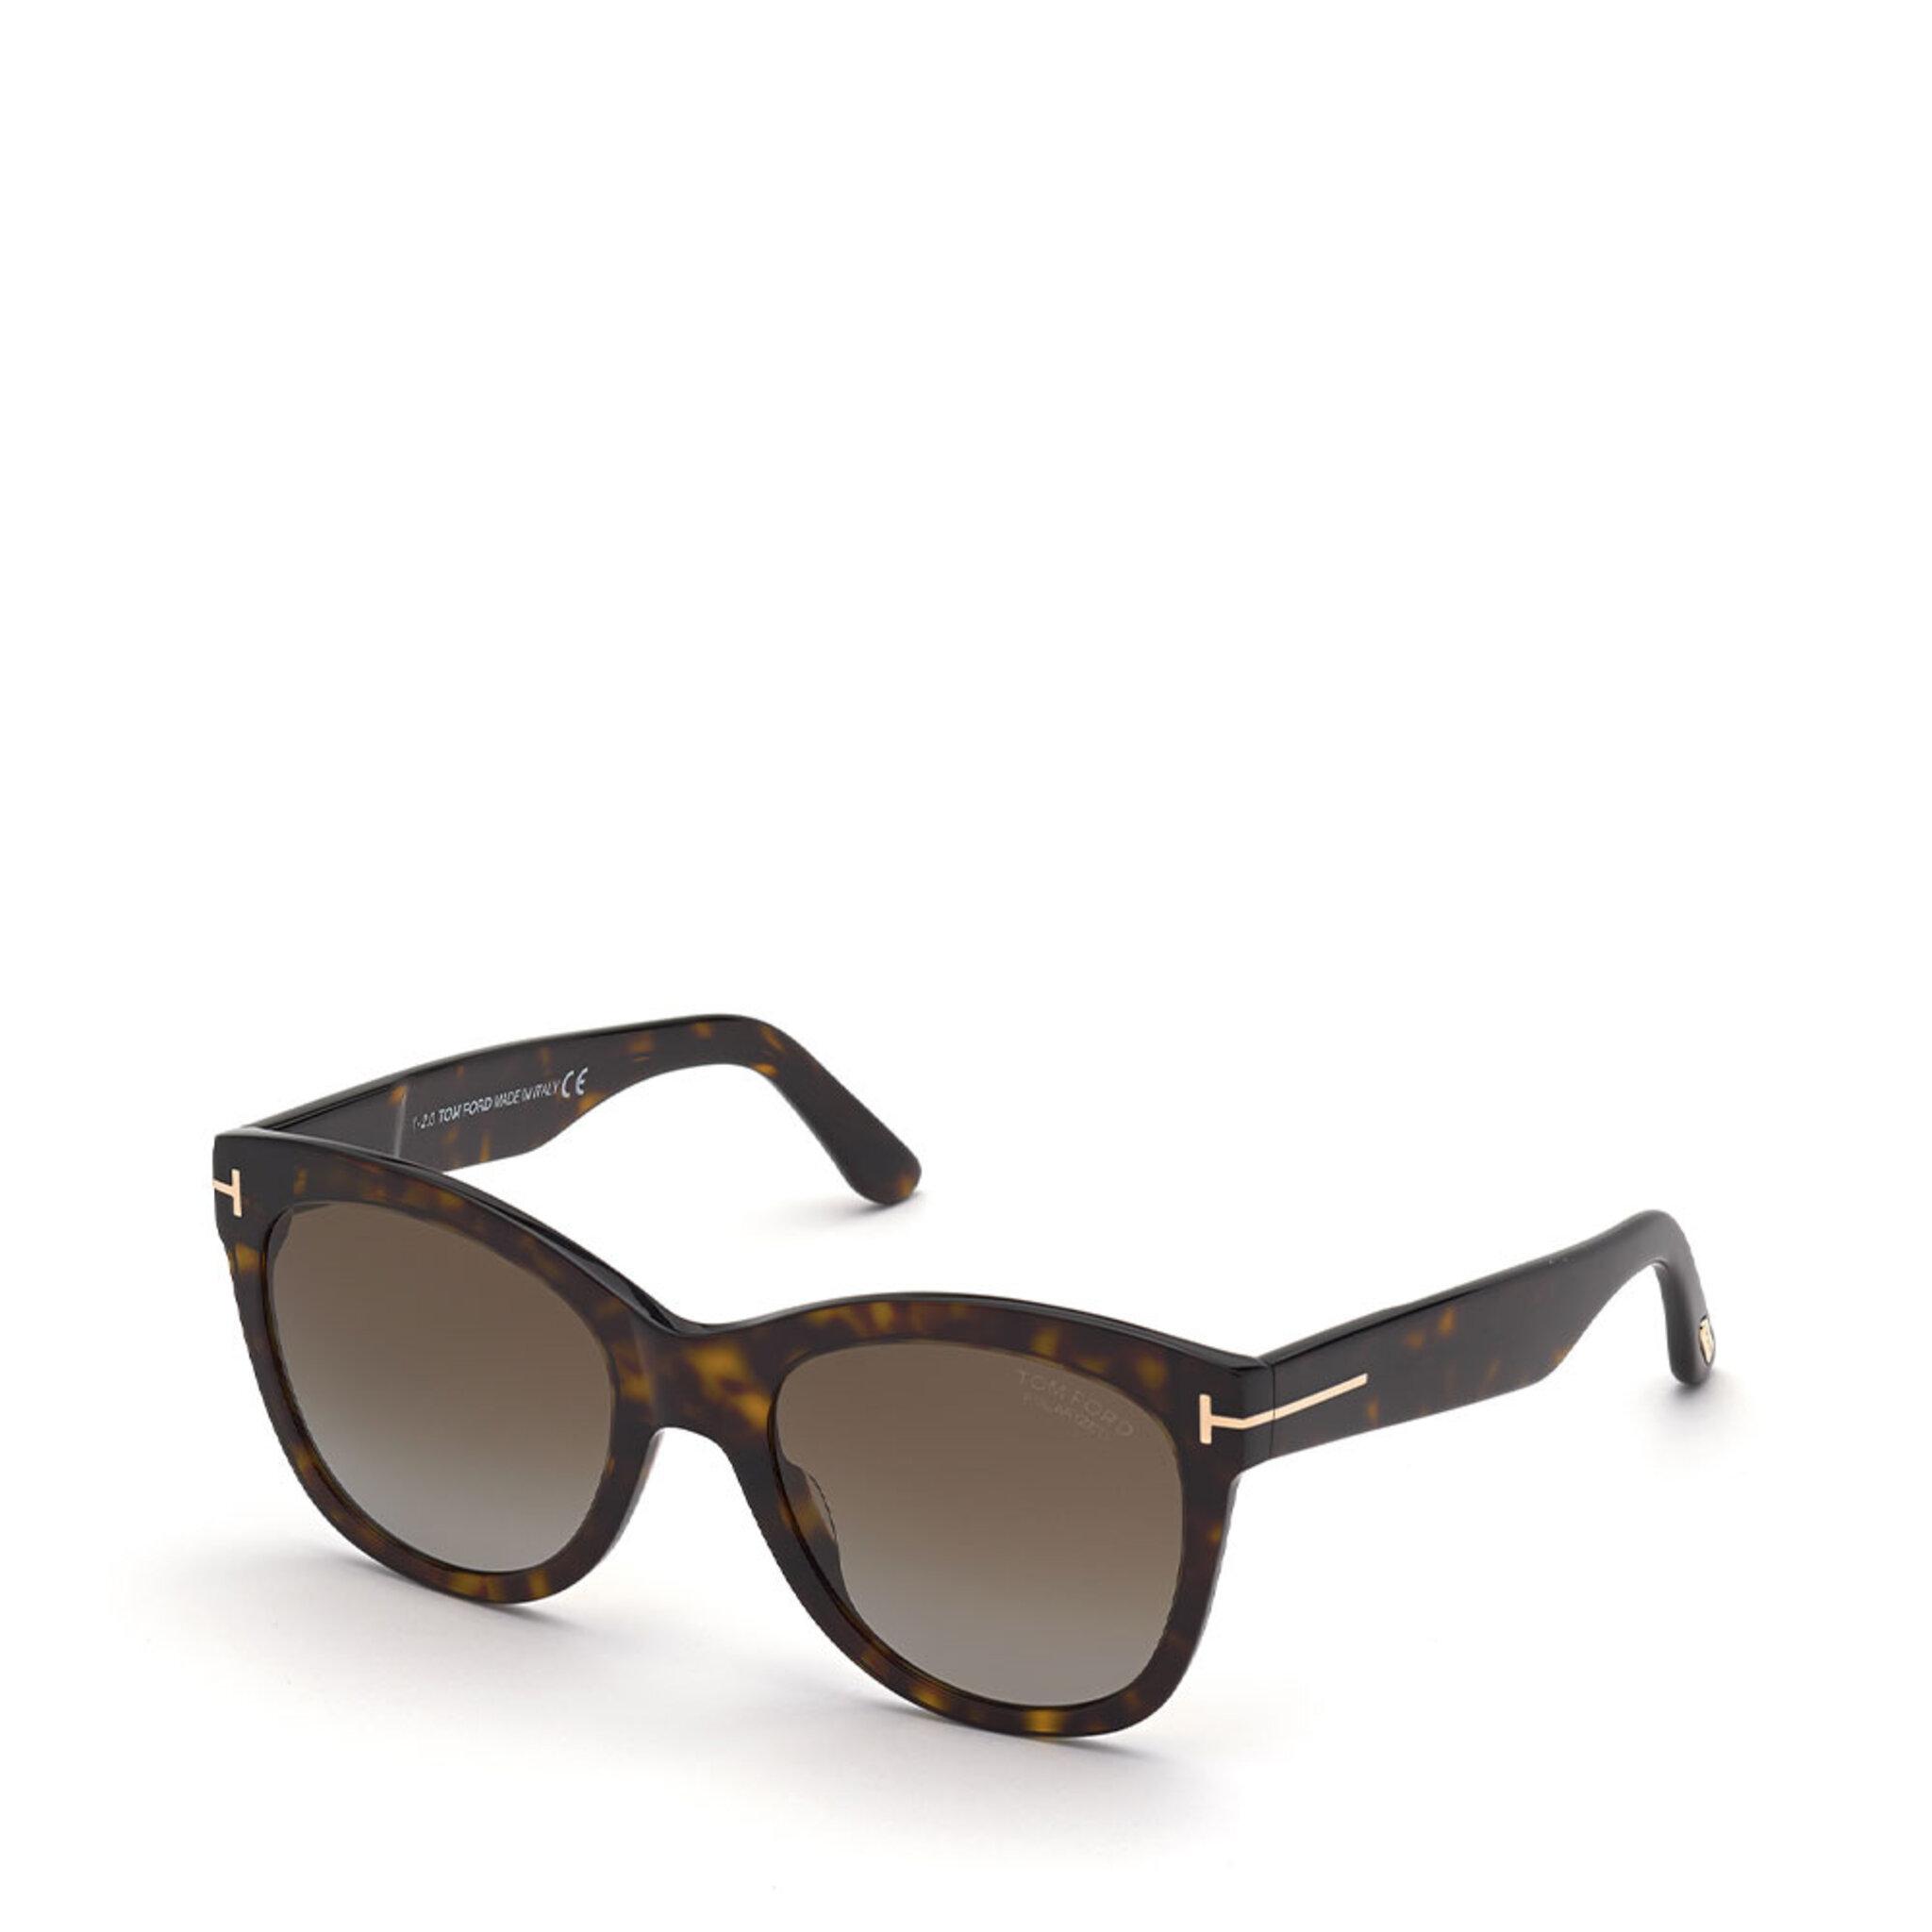 Sunglasses FT0870 Wallace